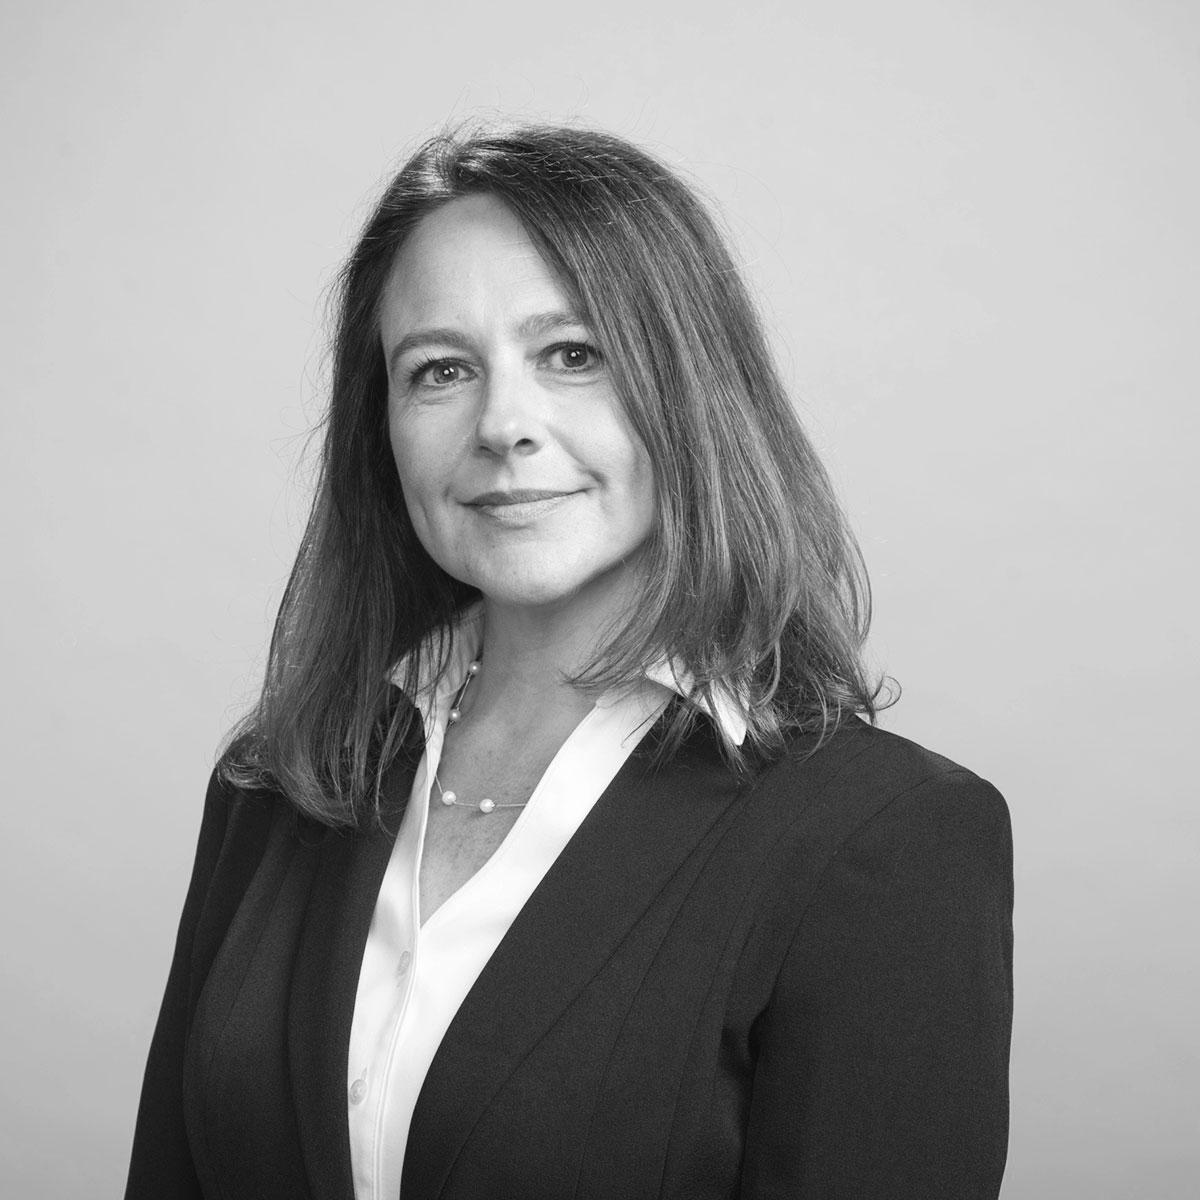 Diana Miles, Bridge Mergers & Acquisitions